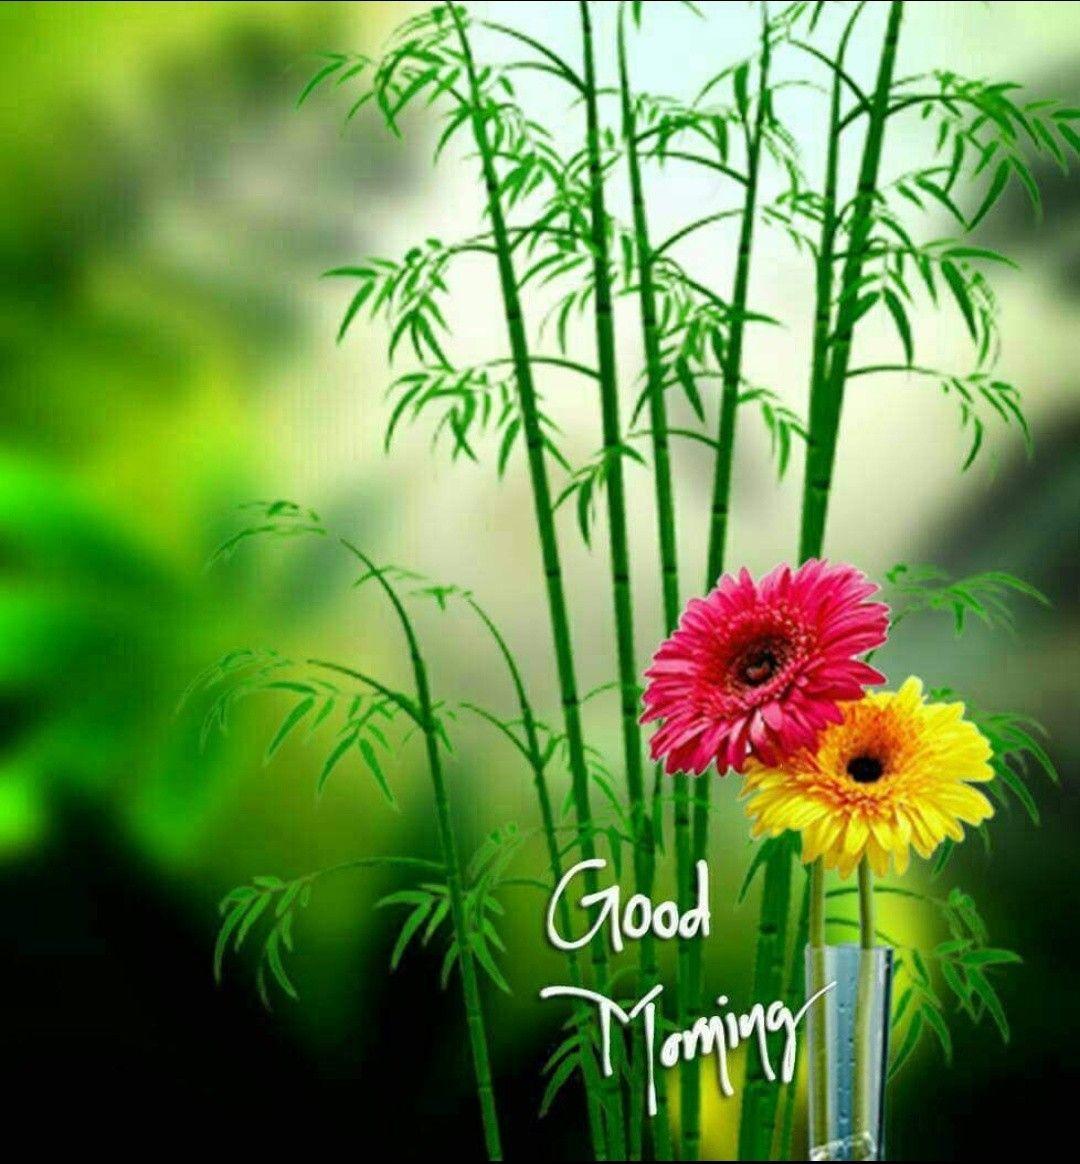 Guten morgen sweetheart - Guten morgen sweetheart